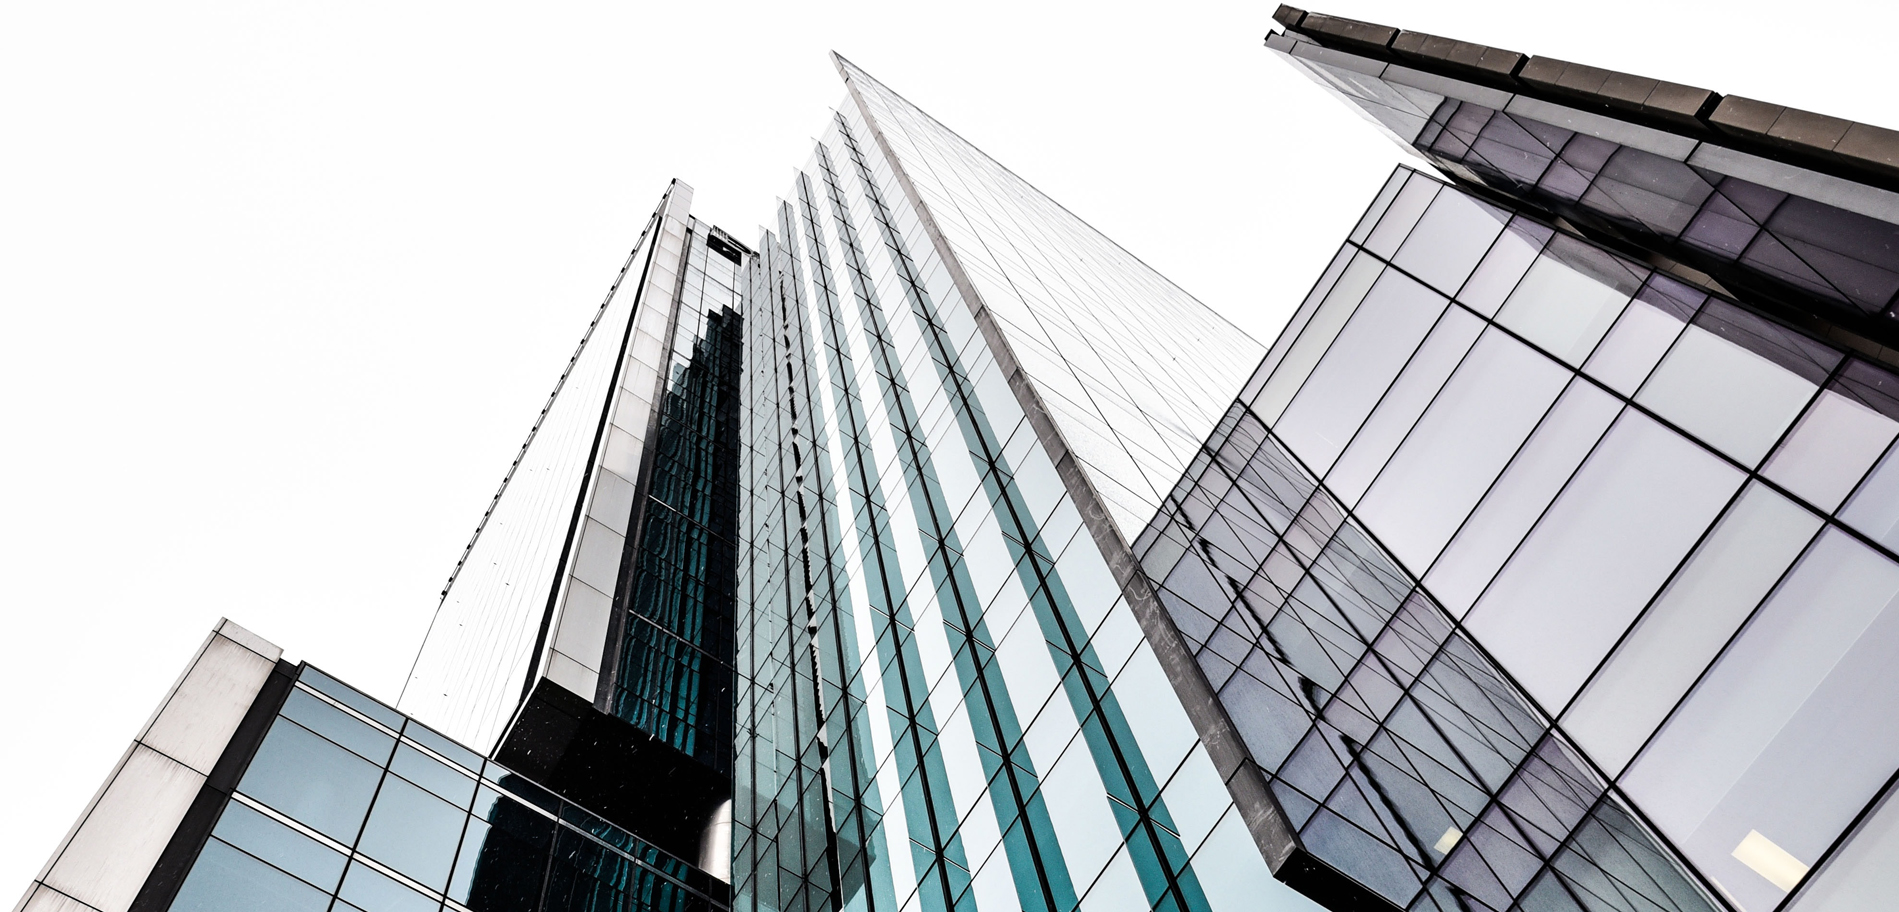 buildingconstructionrealtorindustrywebsites-mobile-responsive-device-brampton-thewebmiracle-ontario-canada-webdevelopment-developer-graphicdesigner